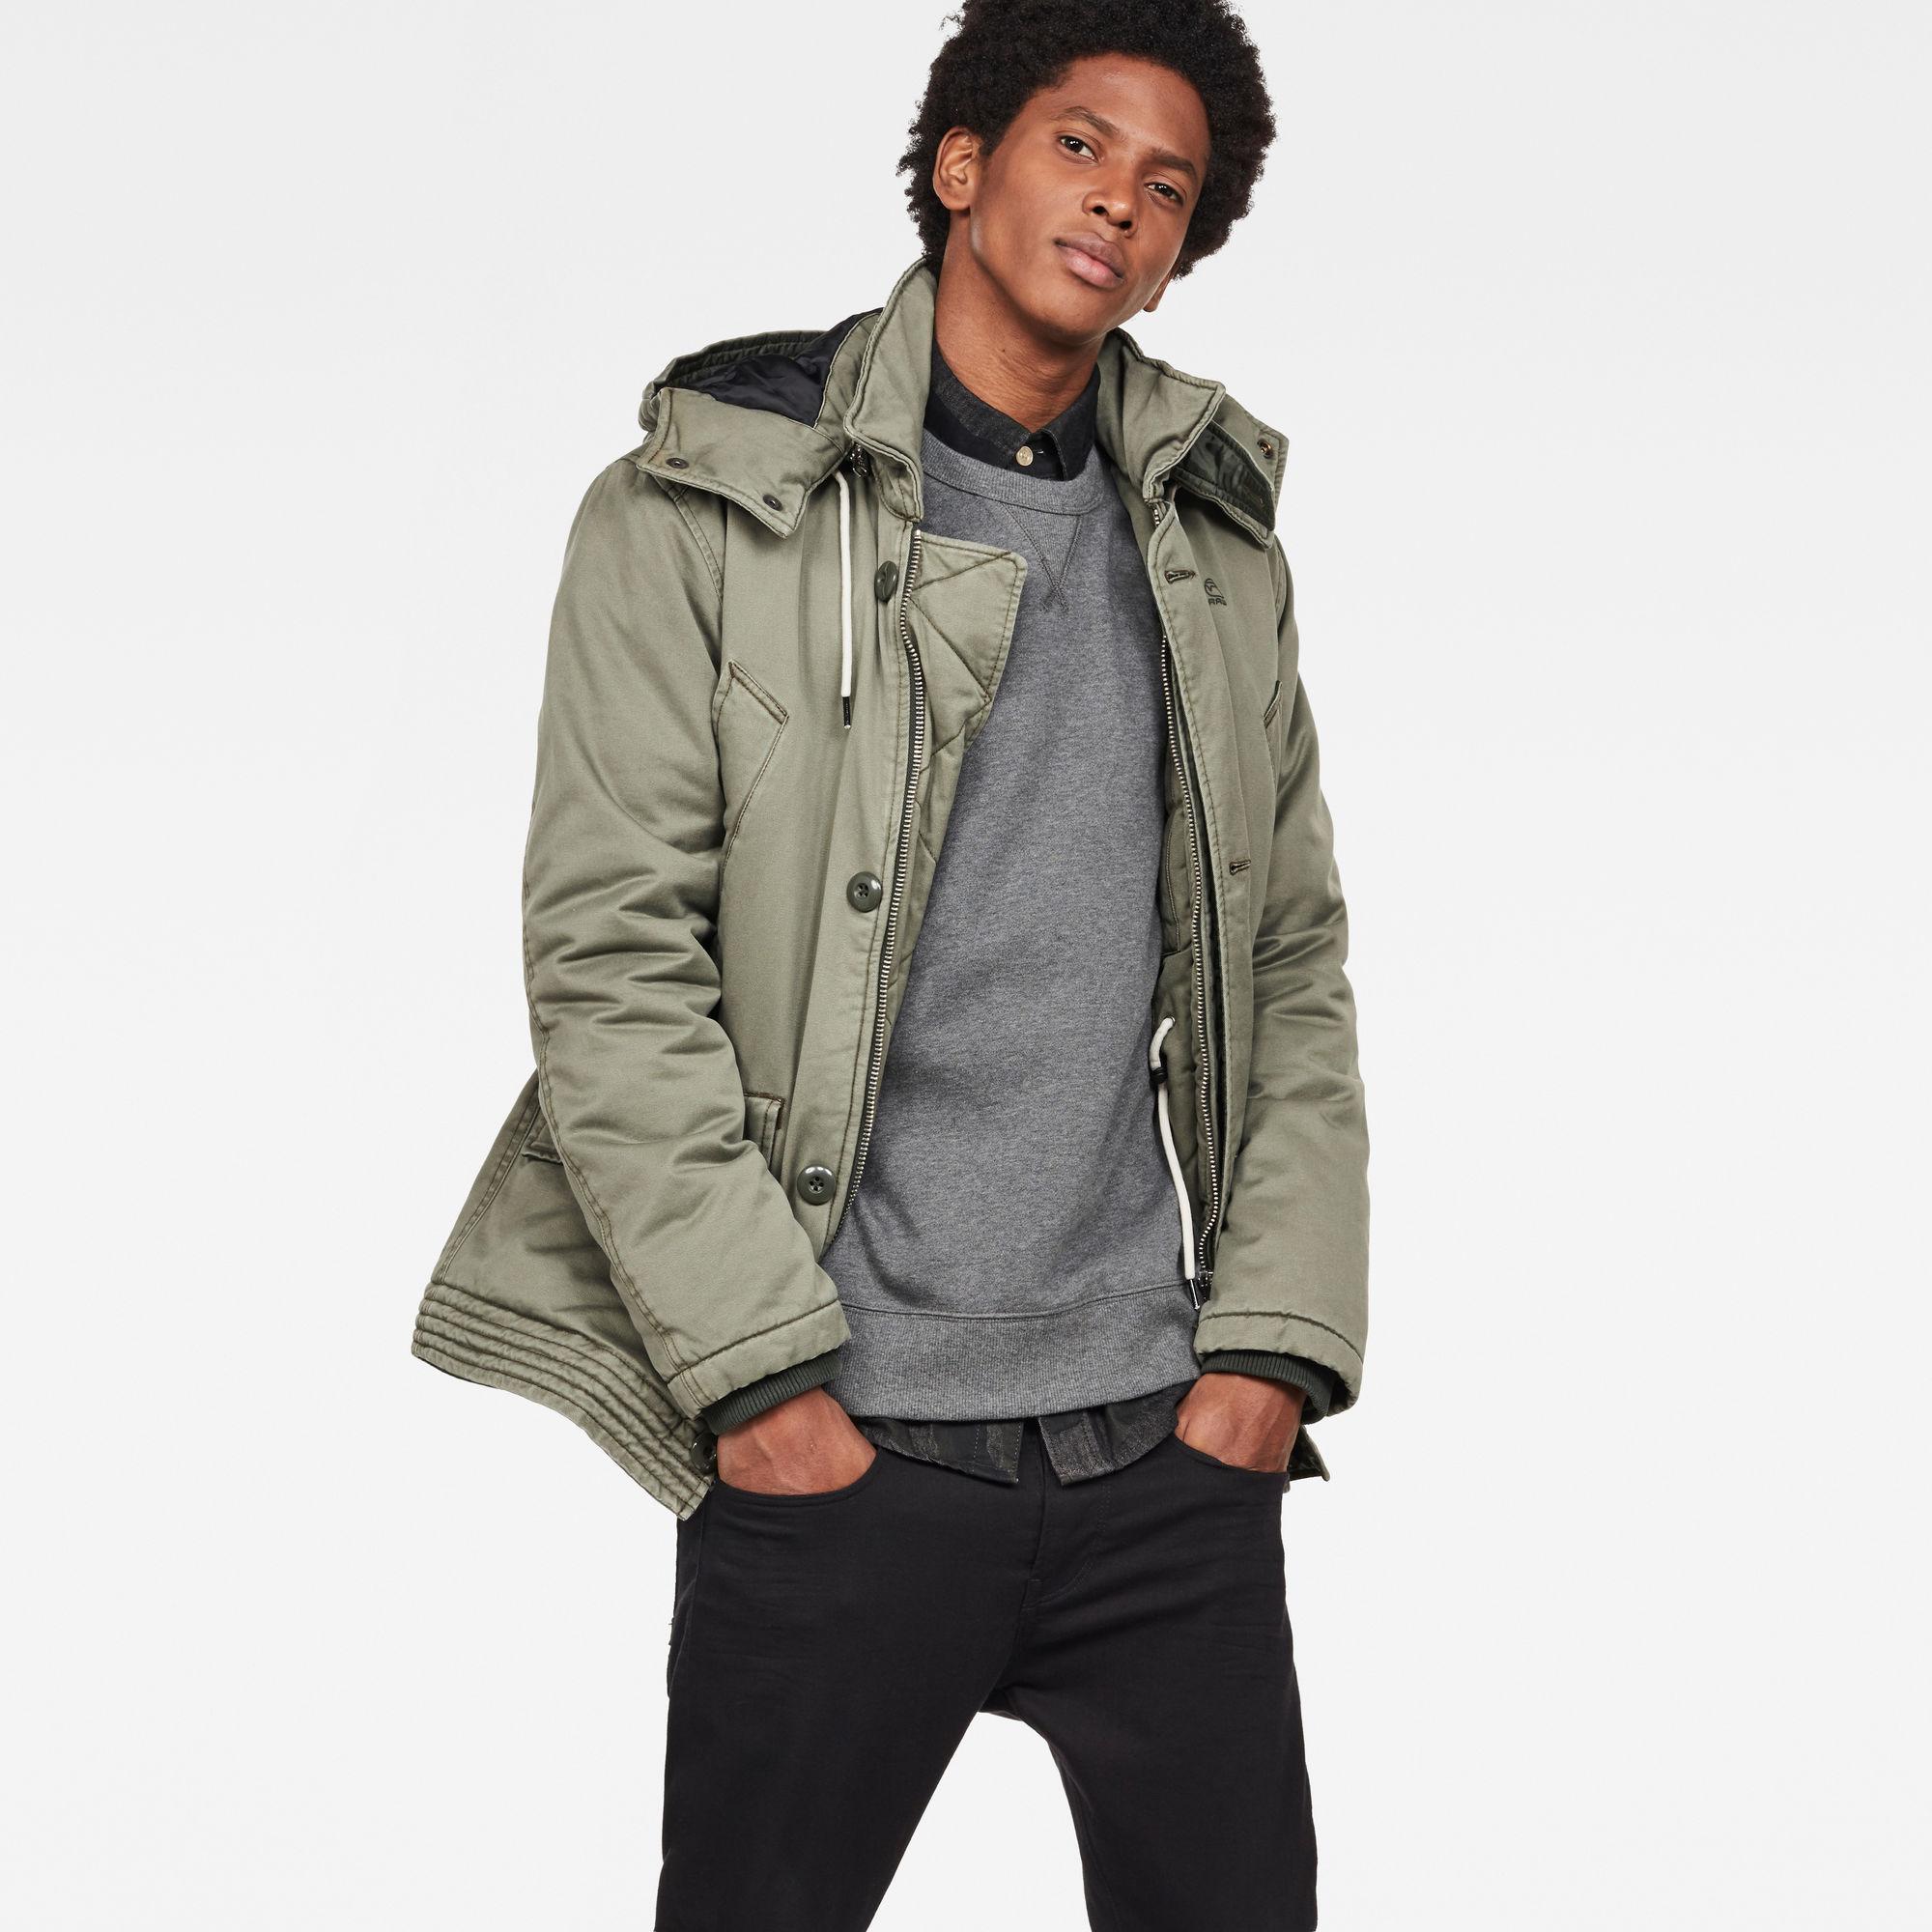 Image of G Star Raw Vodan Caban Hooded Padded Jacket